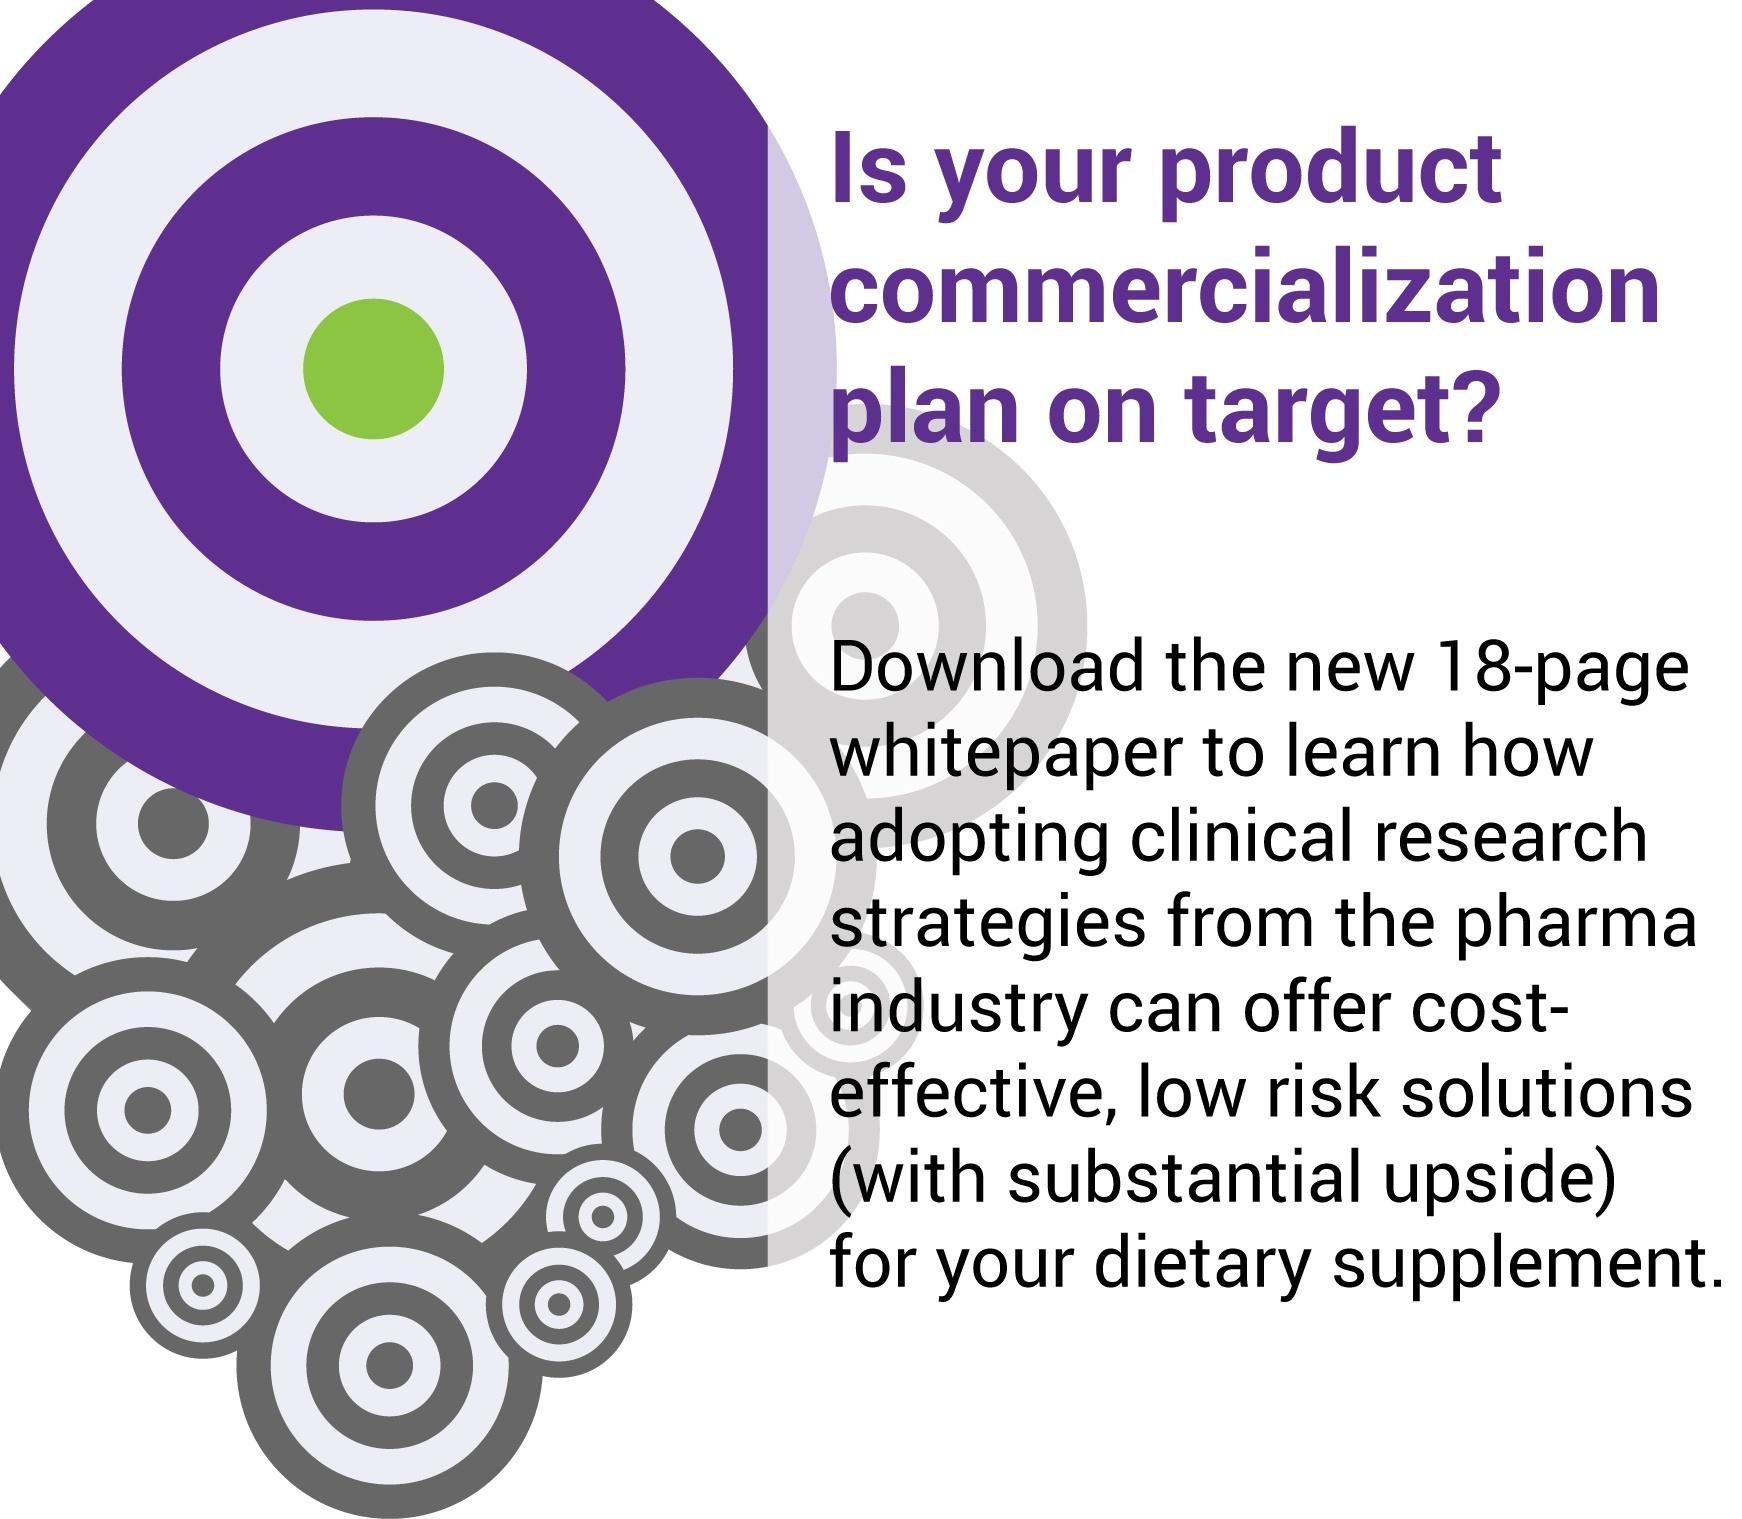 Dietary-supplement-commercialization-whitepaper-2015-2.jpg